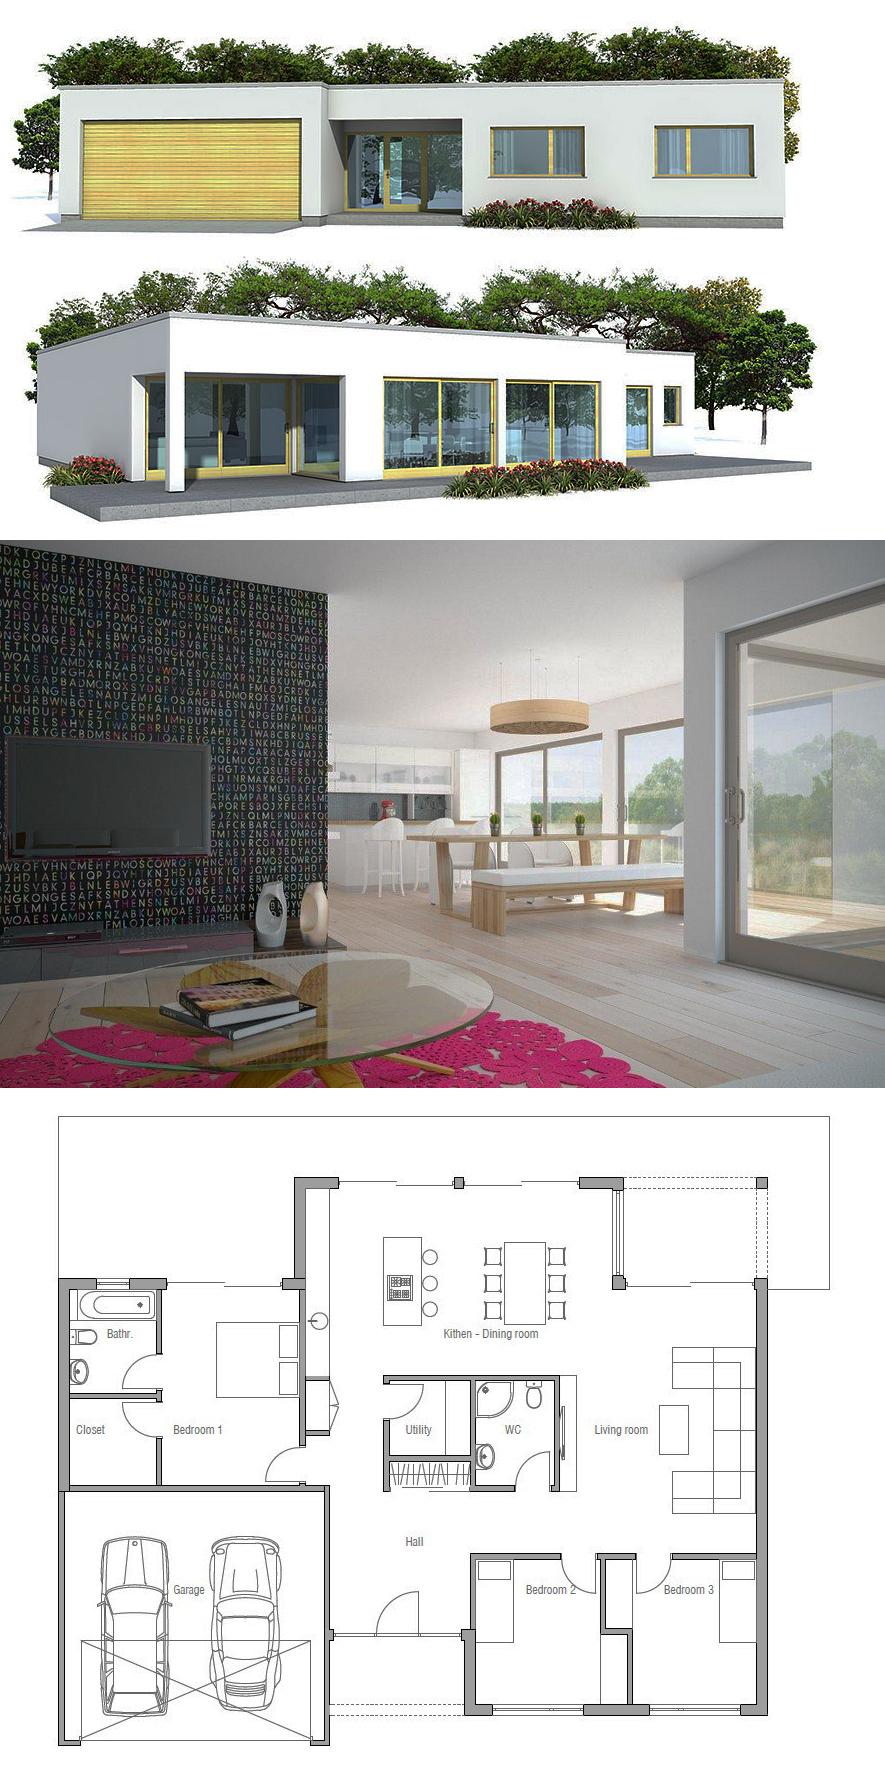 Home Decor House Plans Small House Plans Minimalist Architecture